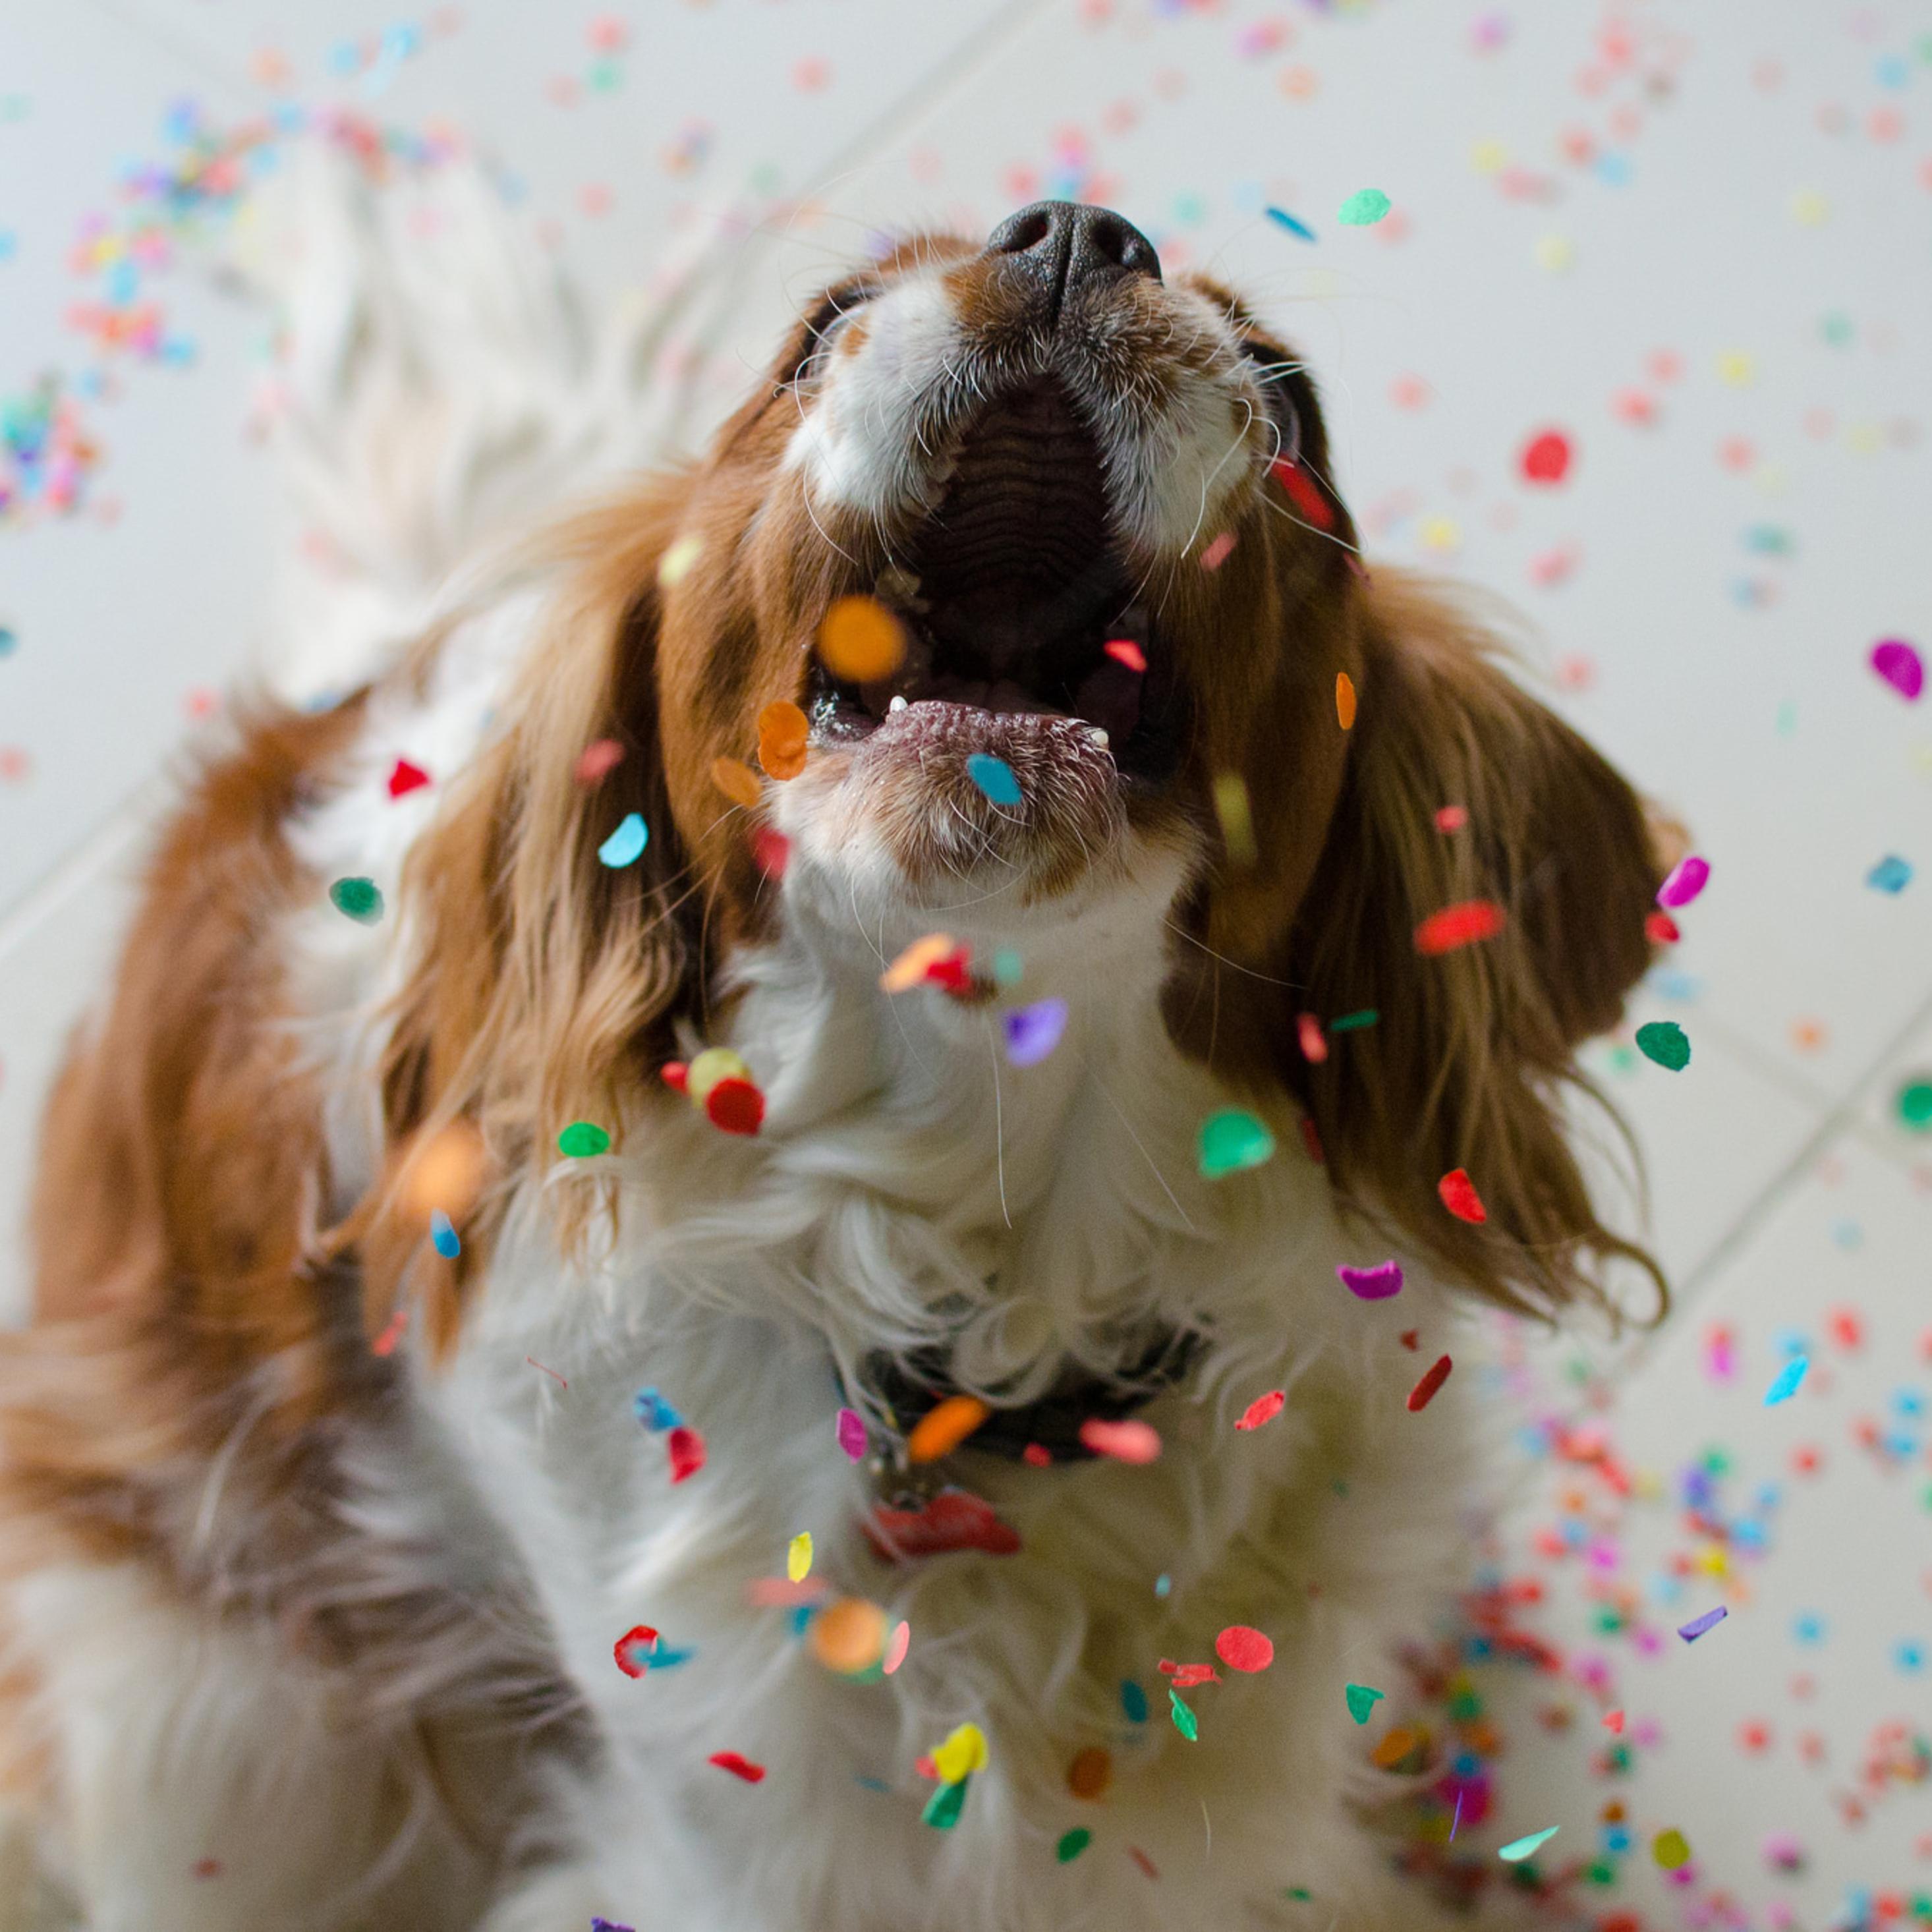 2932x2932 Happy Cute Dog Ipad Pro Retina Display Hd 4k